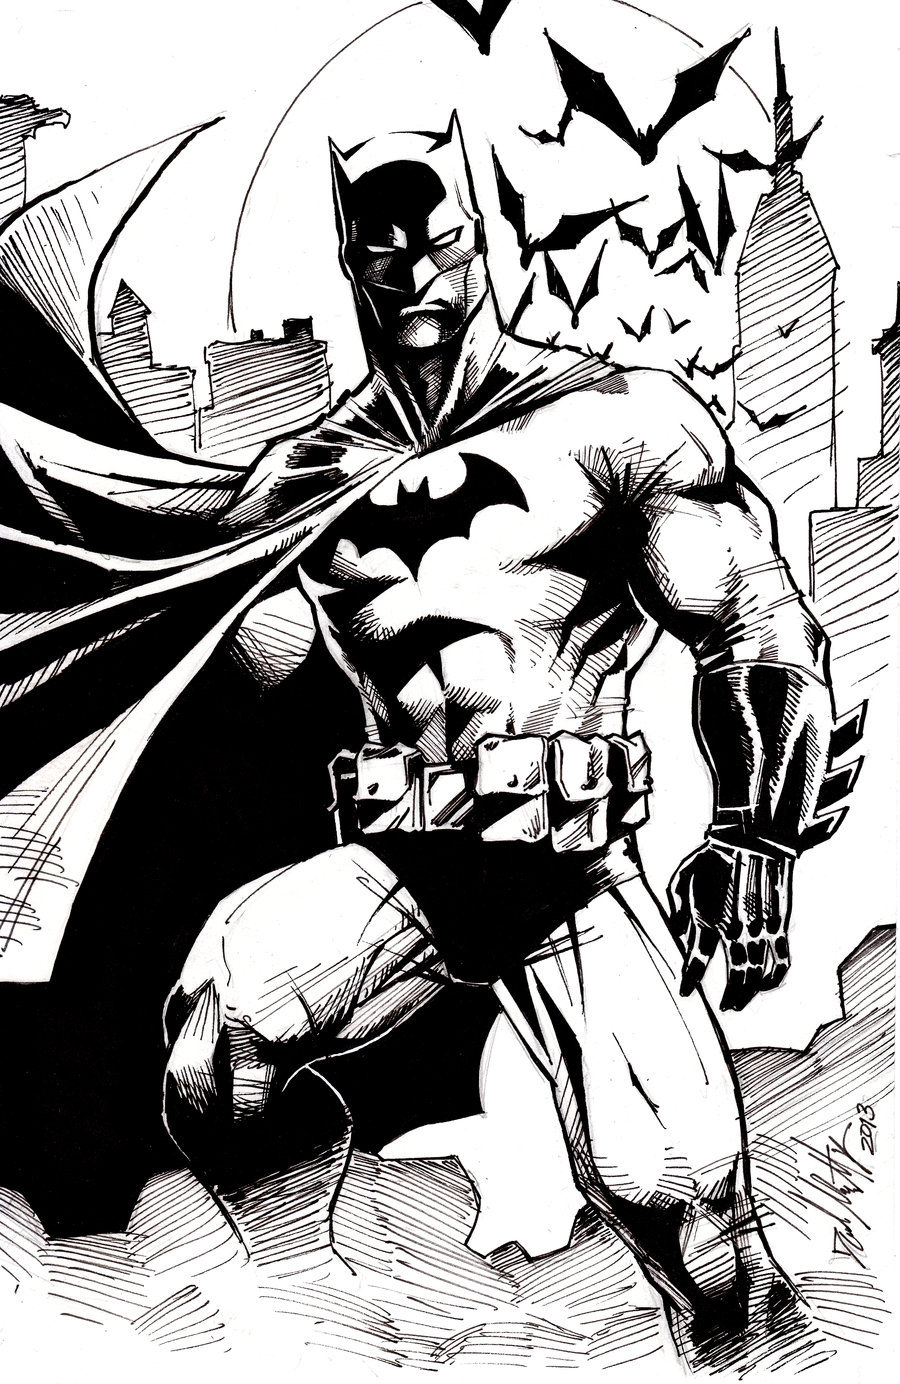 900x1384 Batman Sketch By Dm On @ Drawings